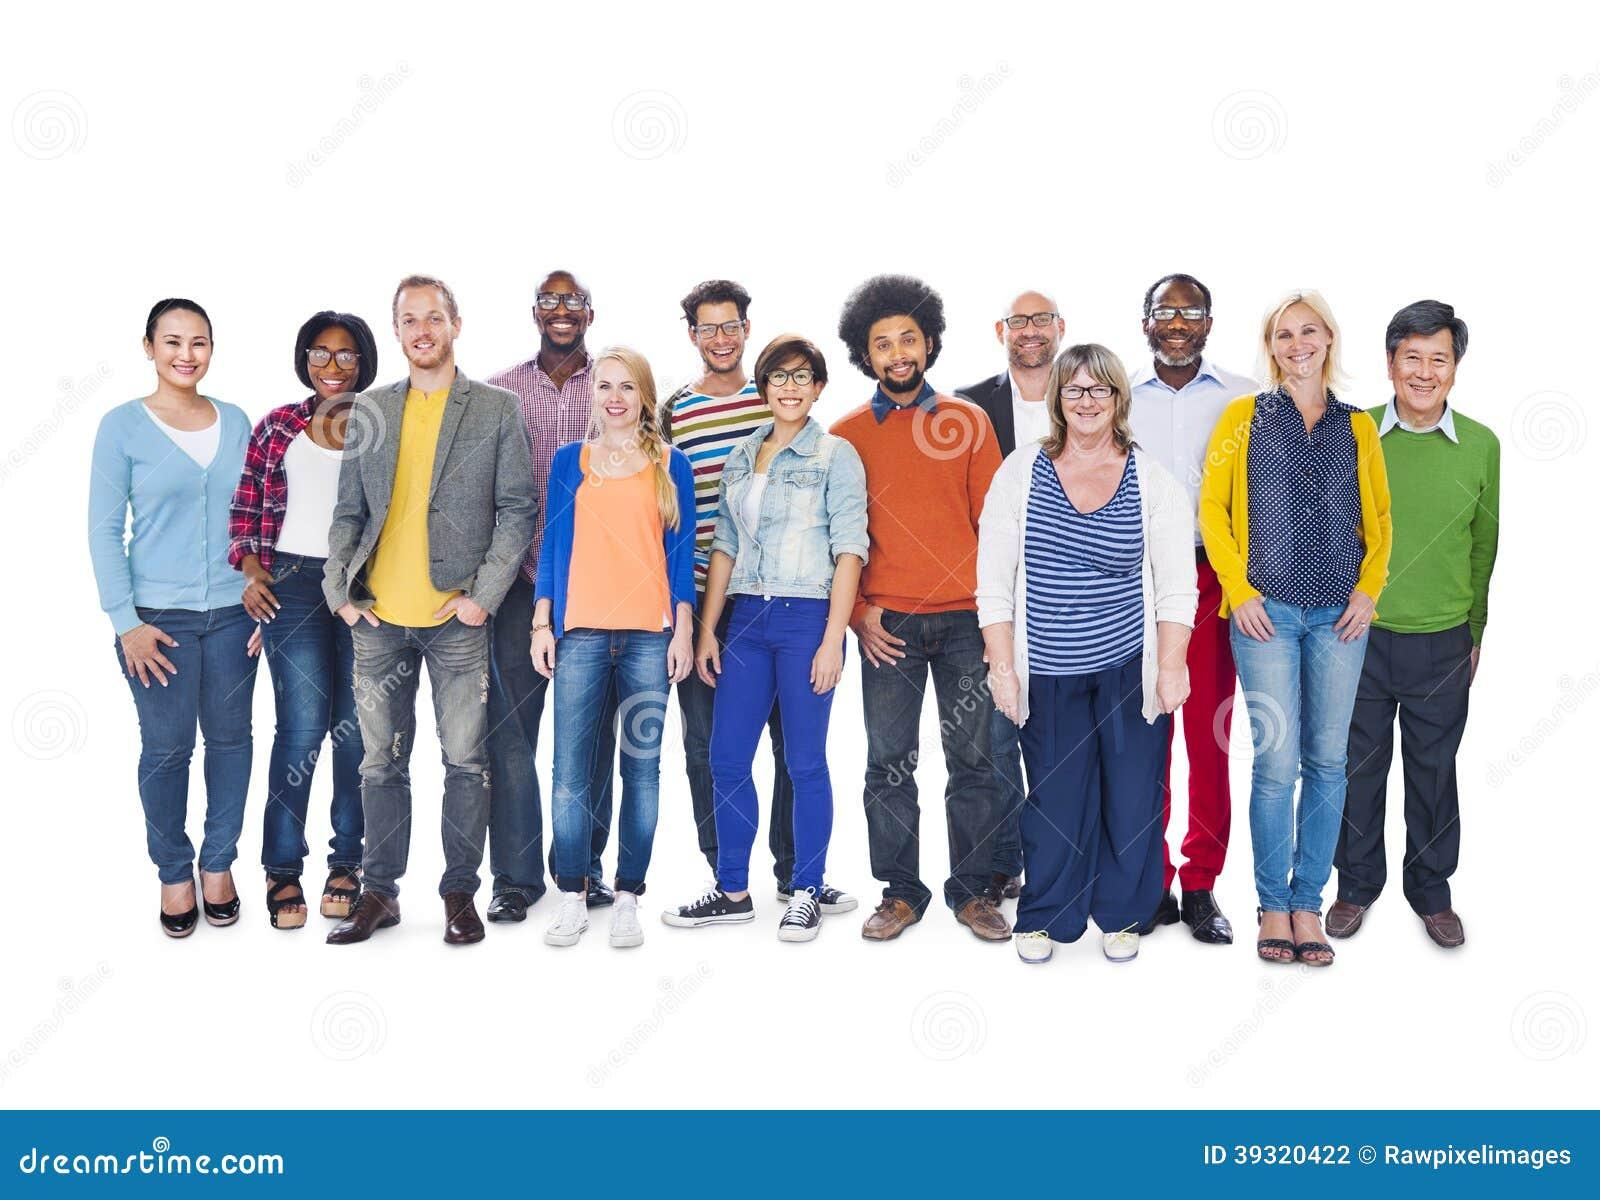 Group Of Multi-Ethnic People Stock Photo - Image: 39320422